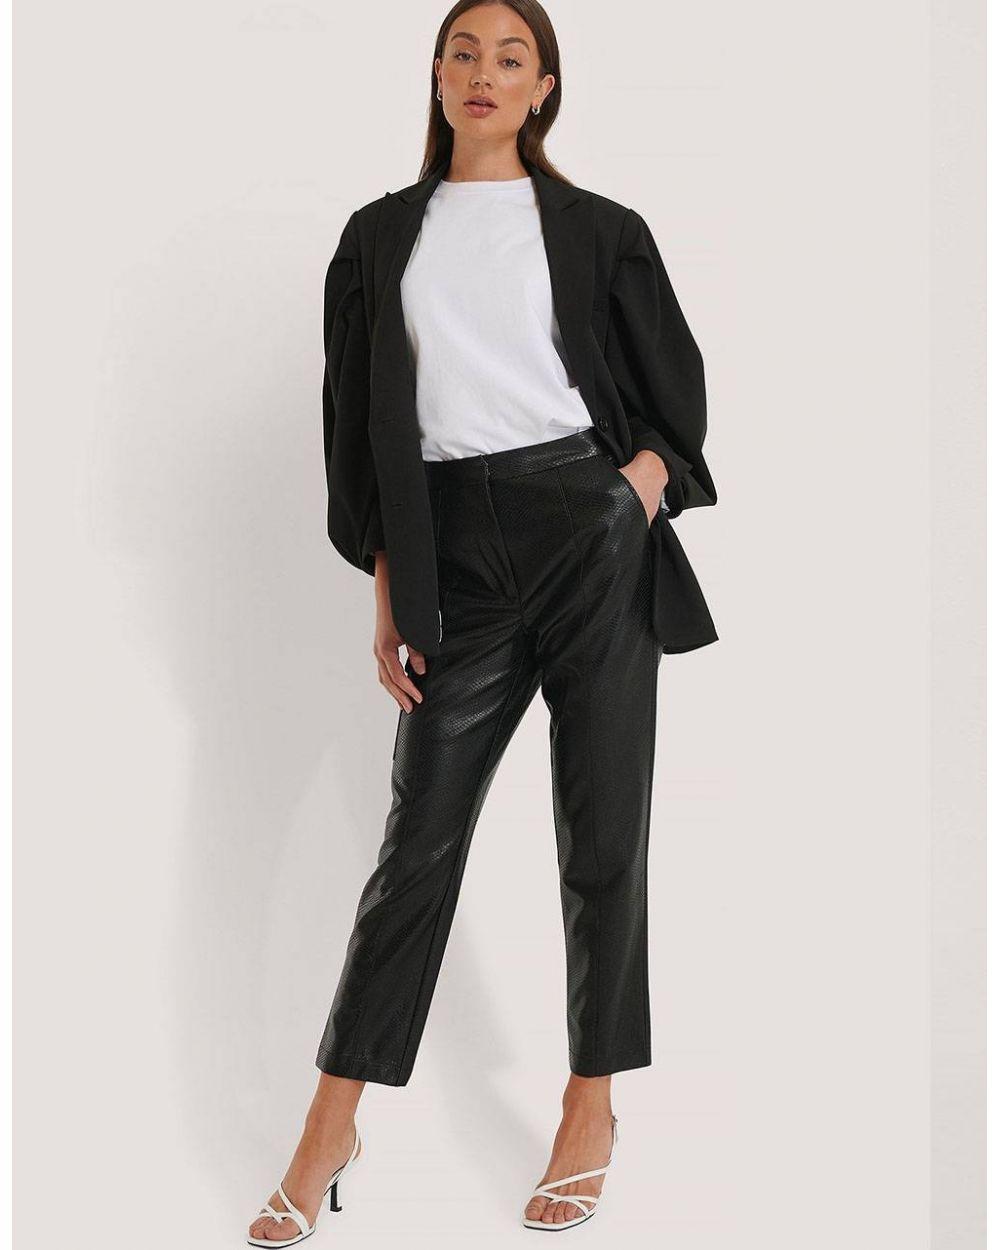 NA-KD pu reptile pocket pants - black NA-KD Pants 82,00€